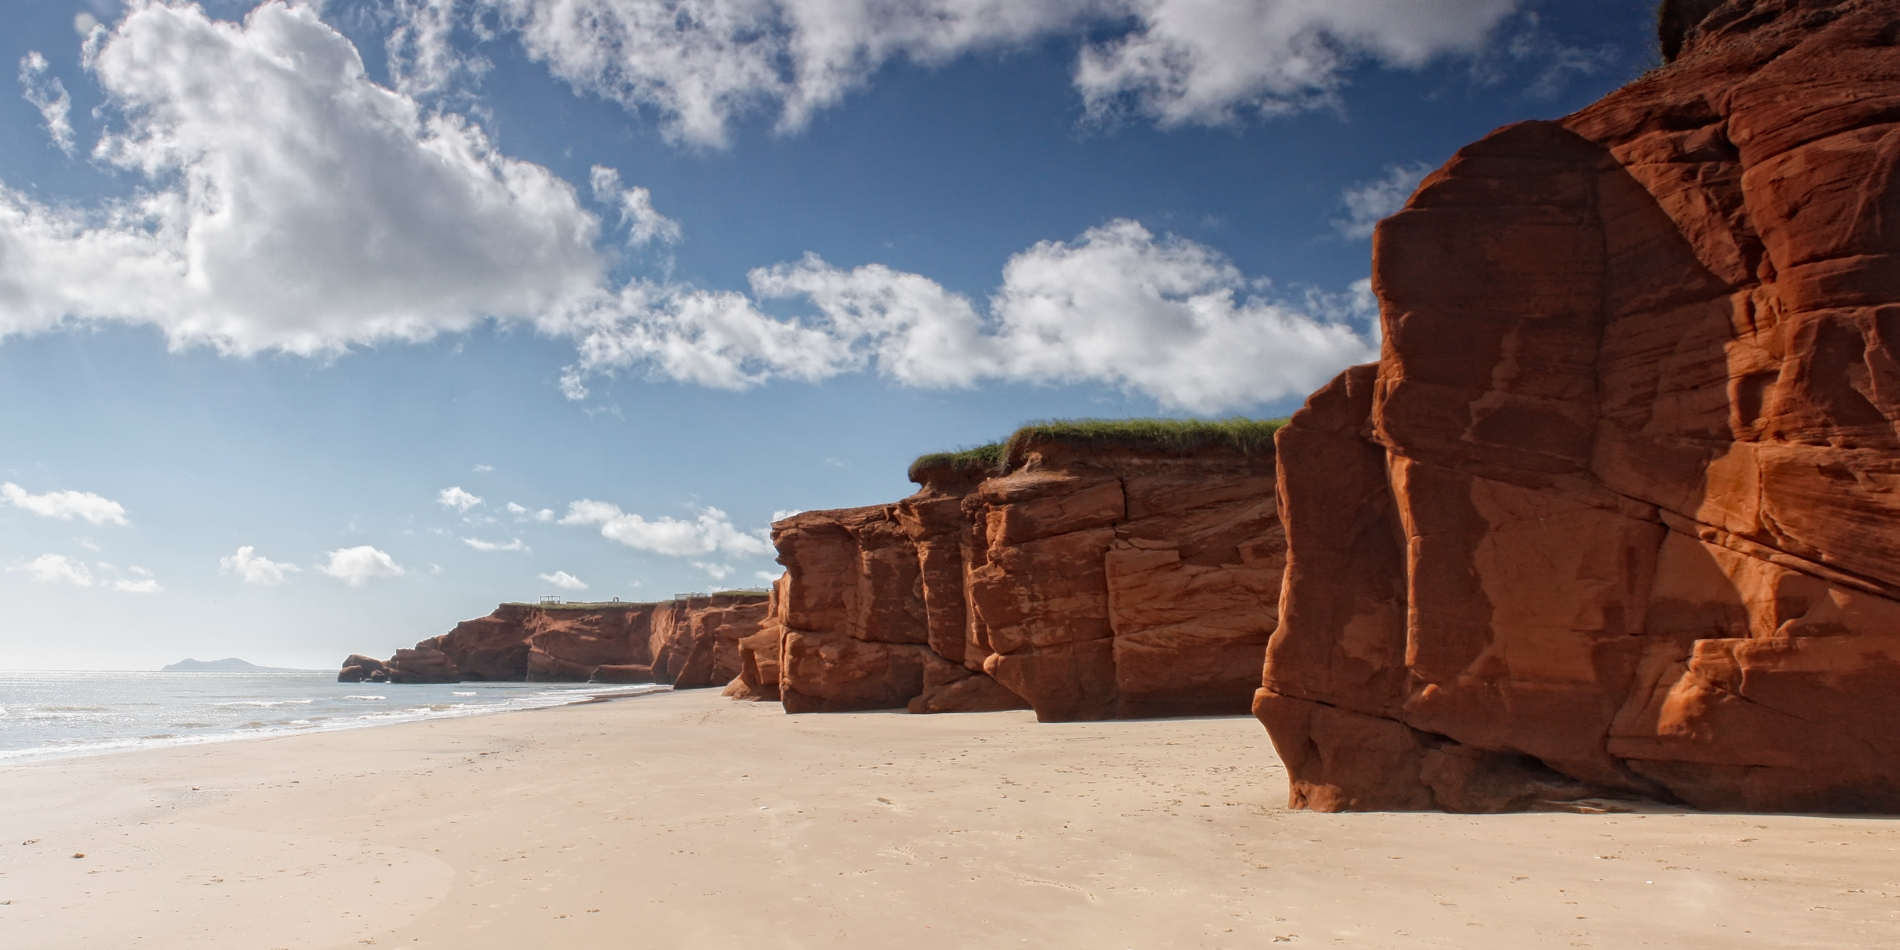 pano-dune du sud4-good.jpg